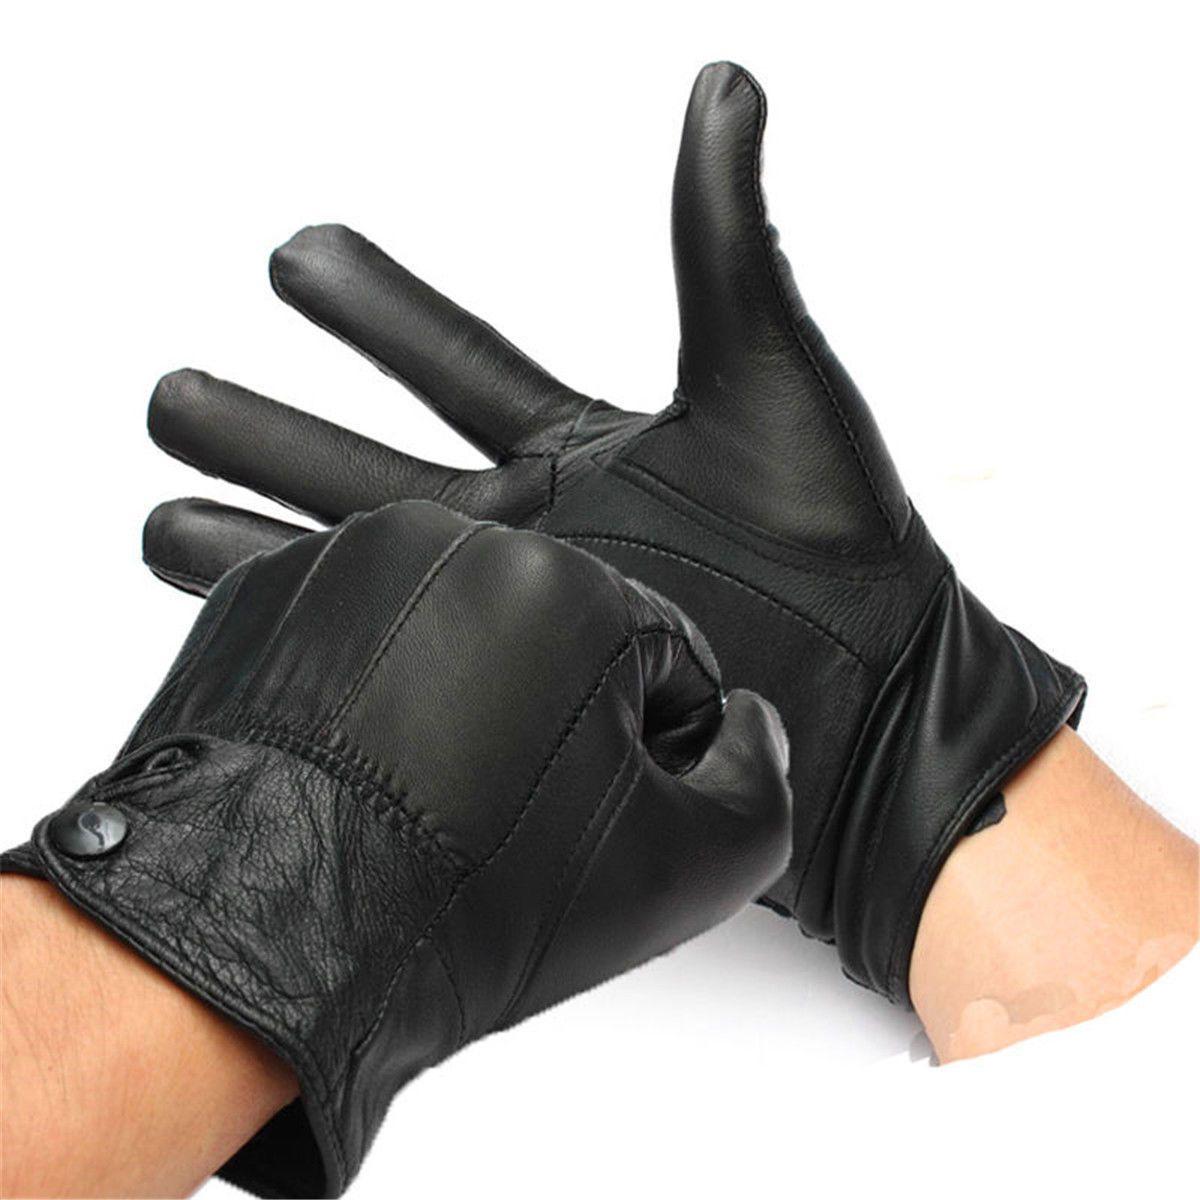 Motorcycle gloves exoskeleton - Premium Leather Motorcycle Moto Bike Biker Riding Winter Coral Fleece Warm Glove